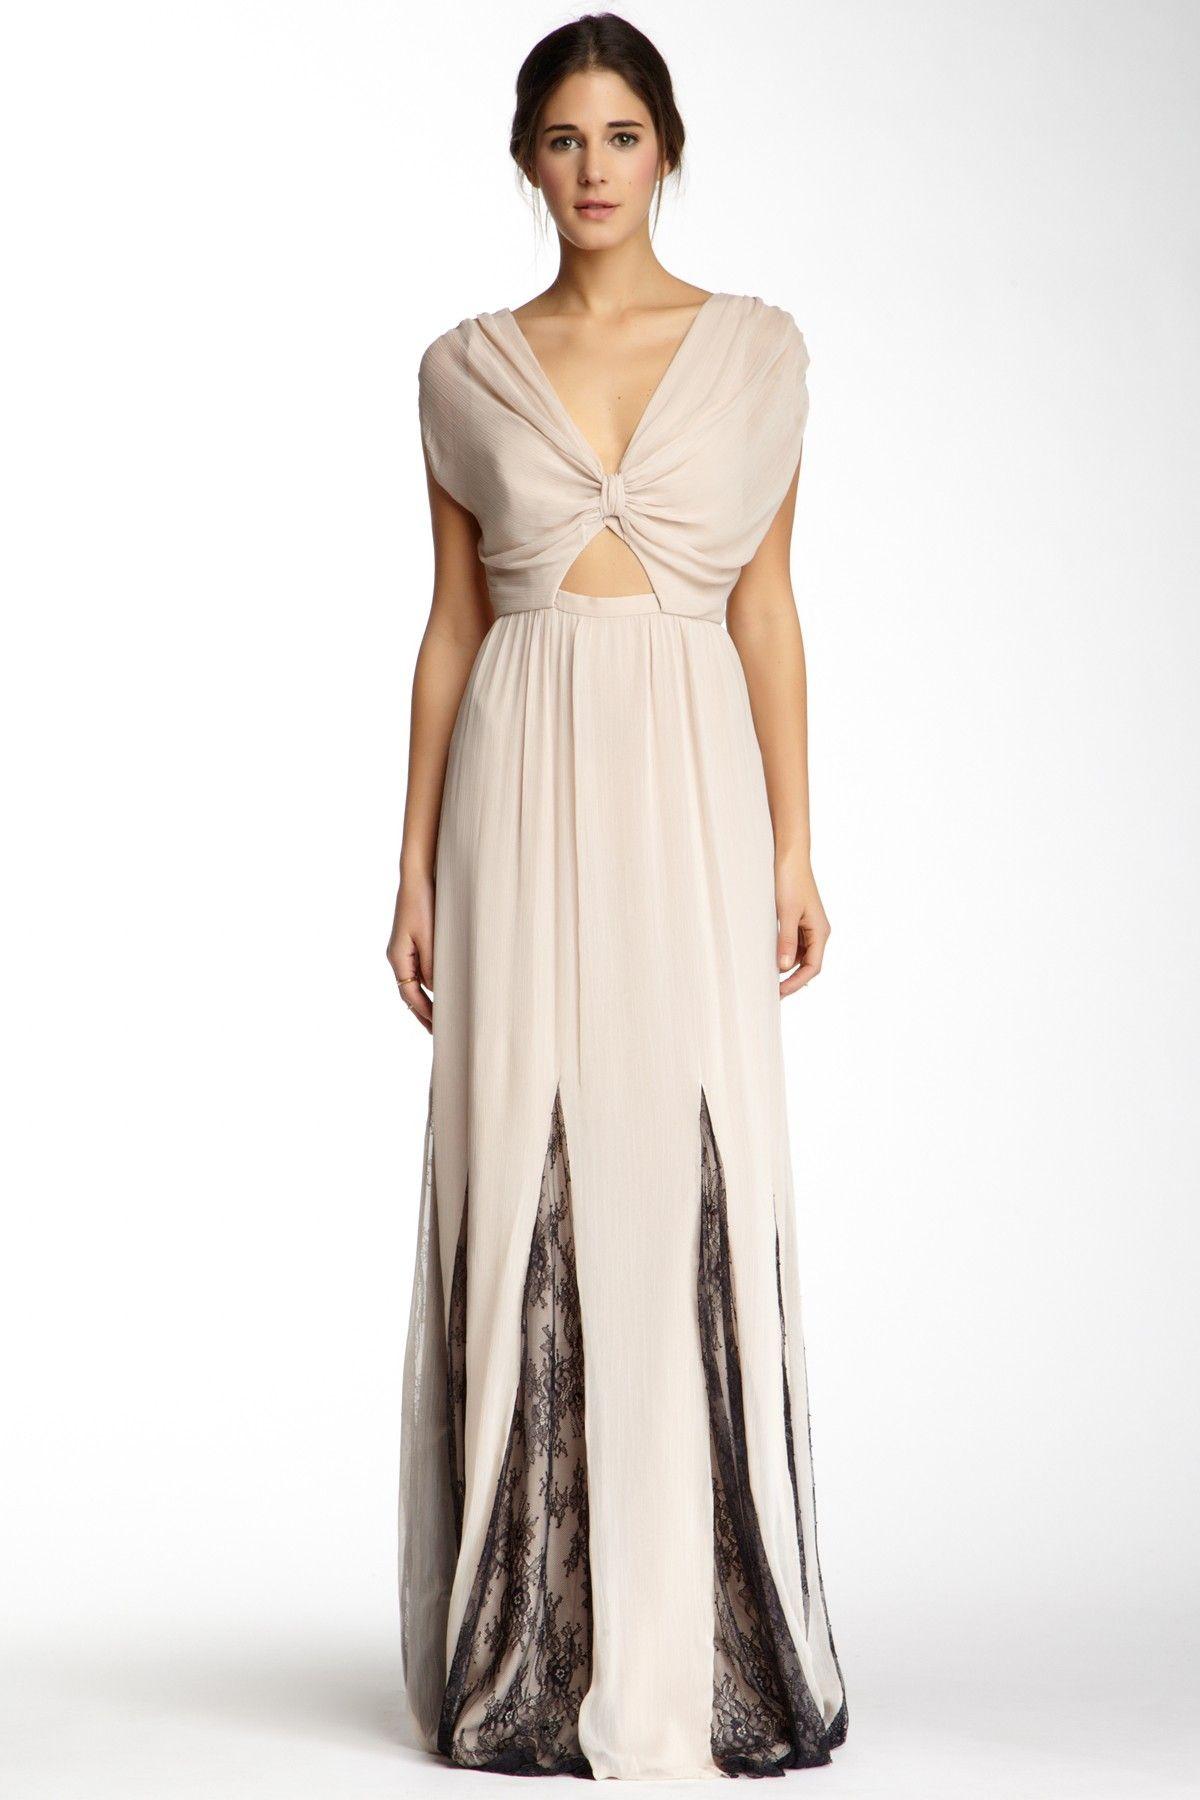 Knotted Lace Trim Maxi Dress   Lace trim, Alice olivia and Maxi dresses